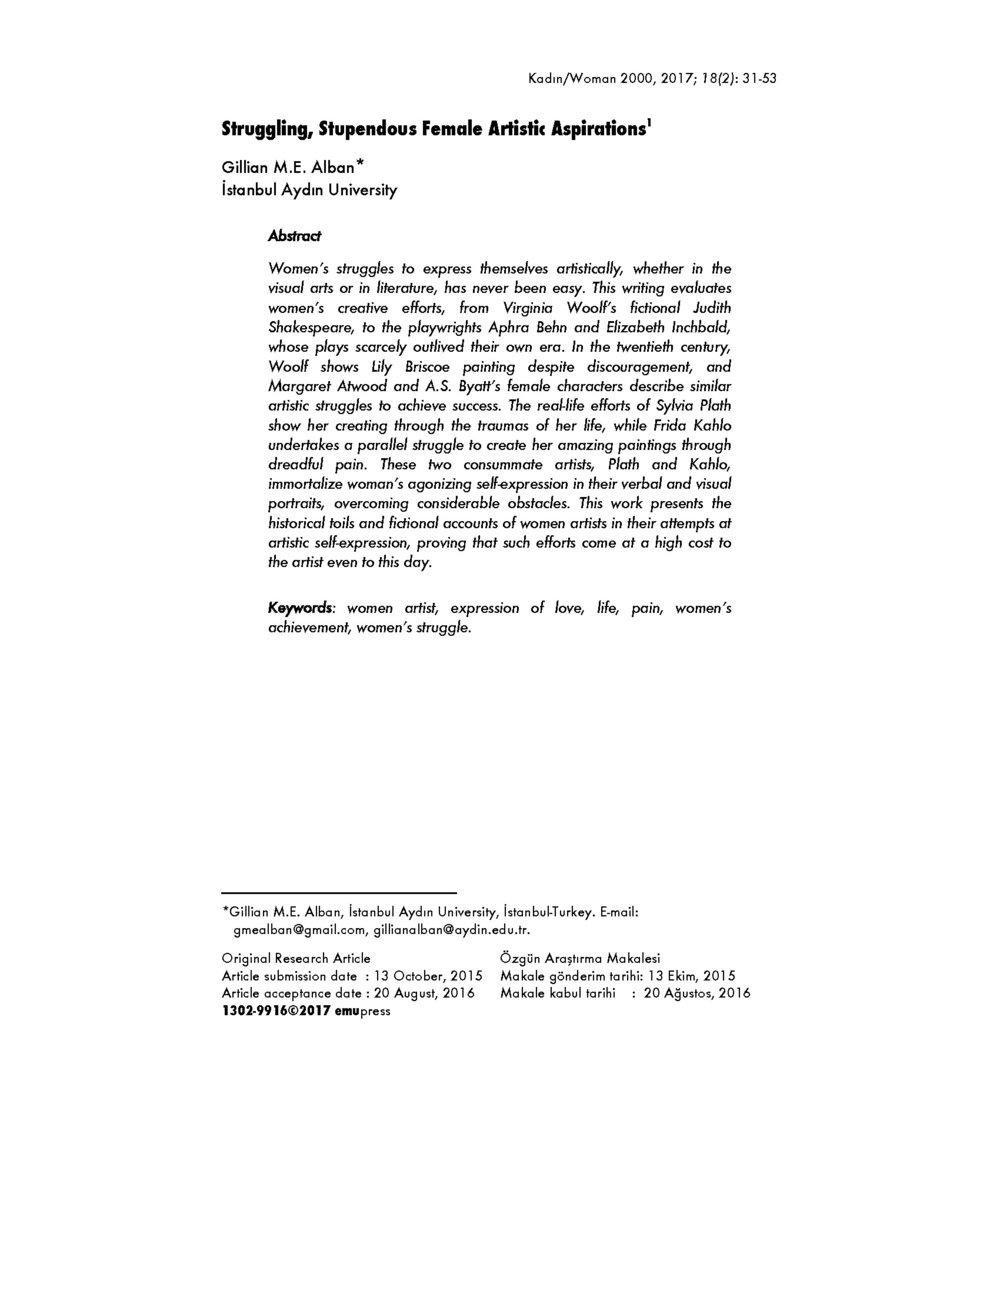 StrugglingStupendousFemalep31_Page_01.jpg